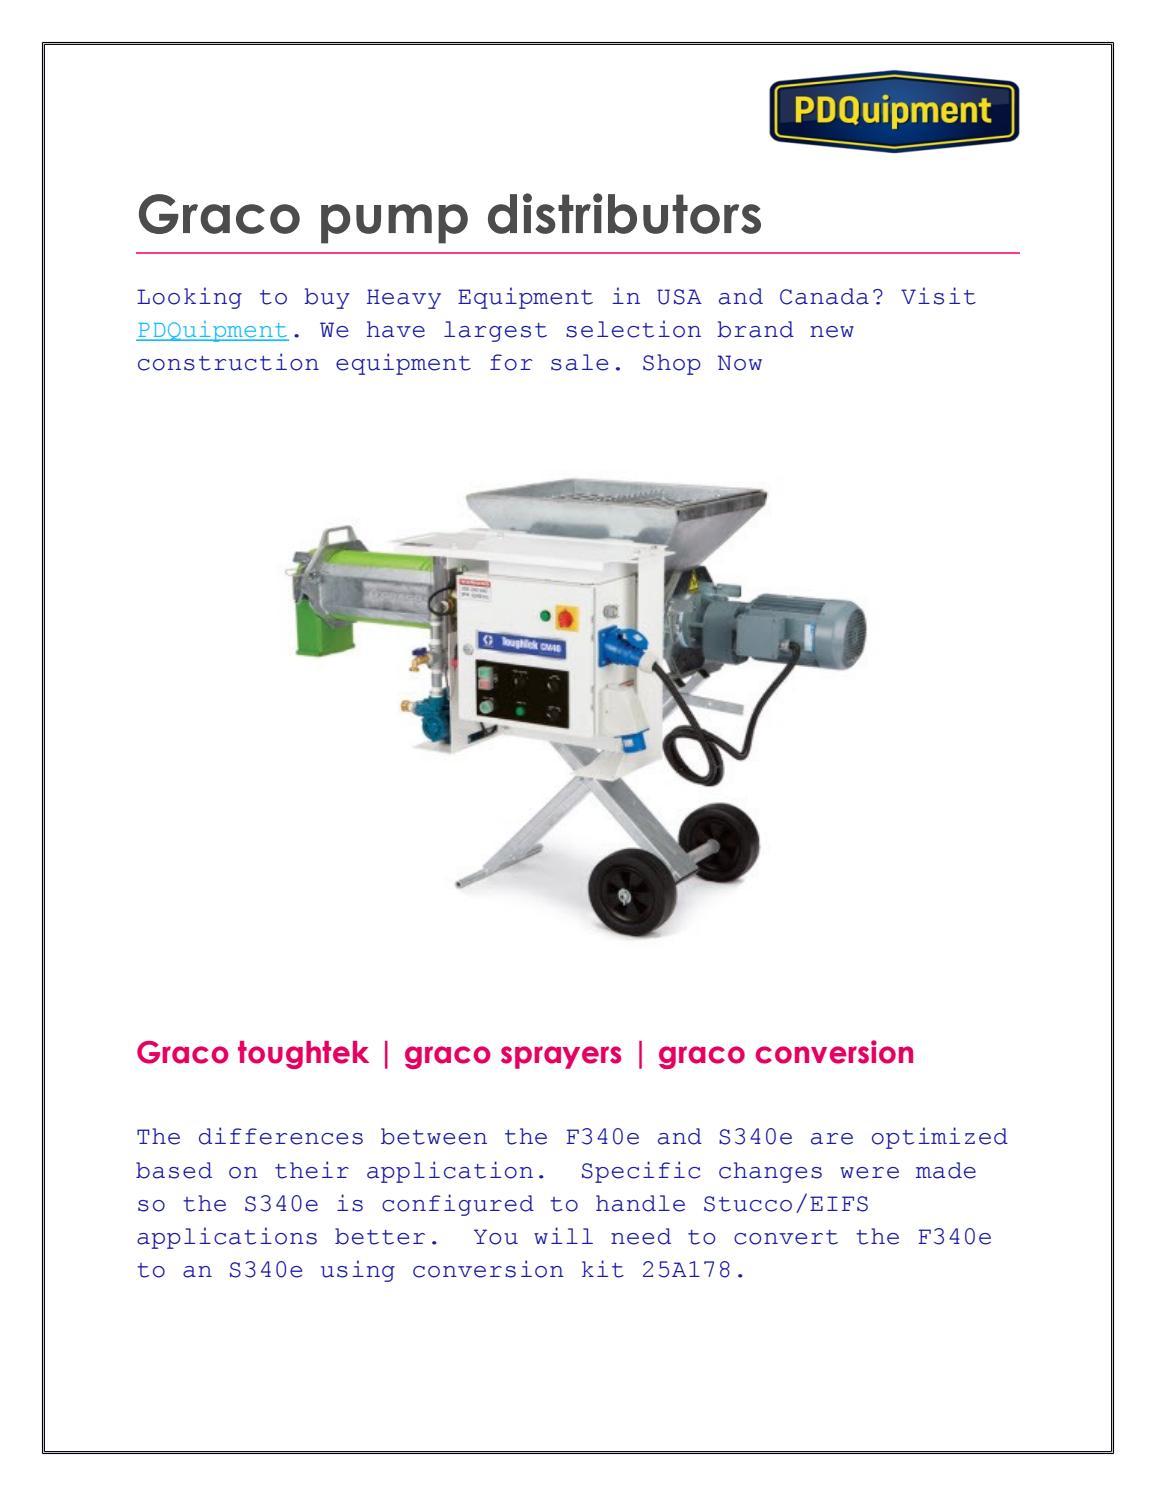 Graco pump distributors by isabella jones - issuu